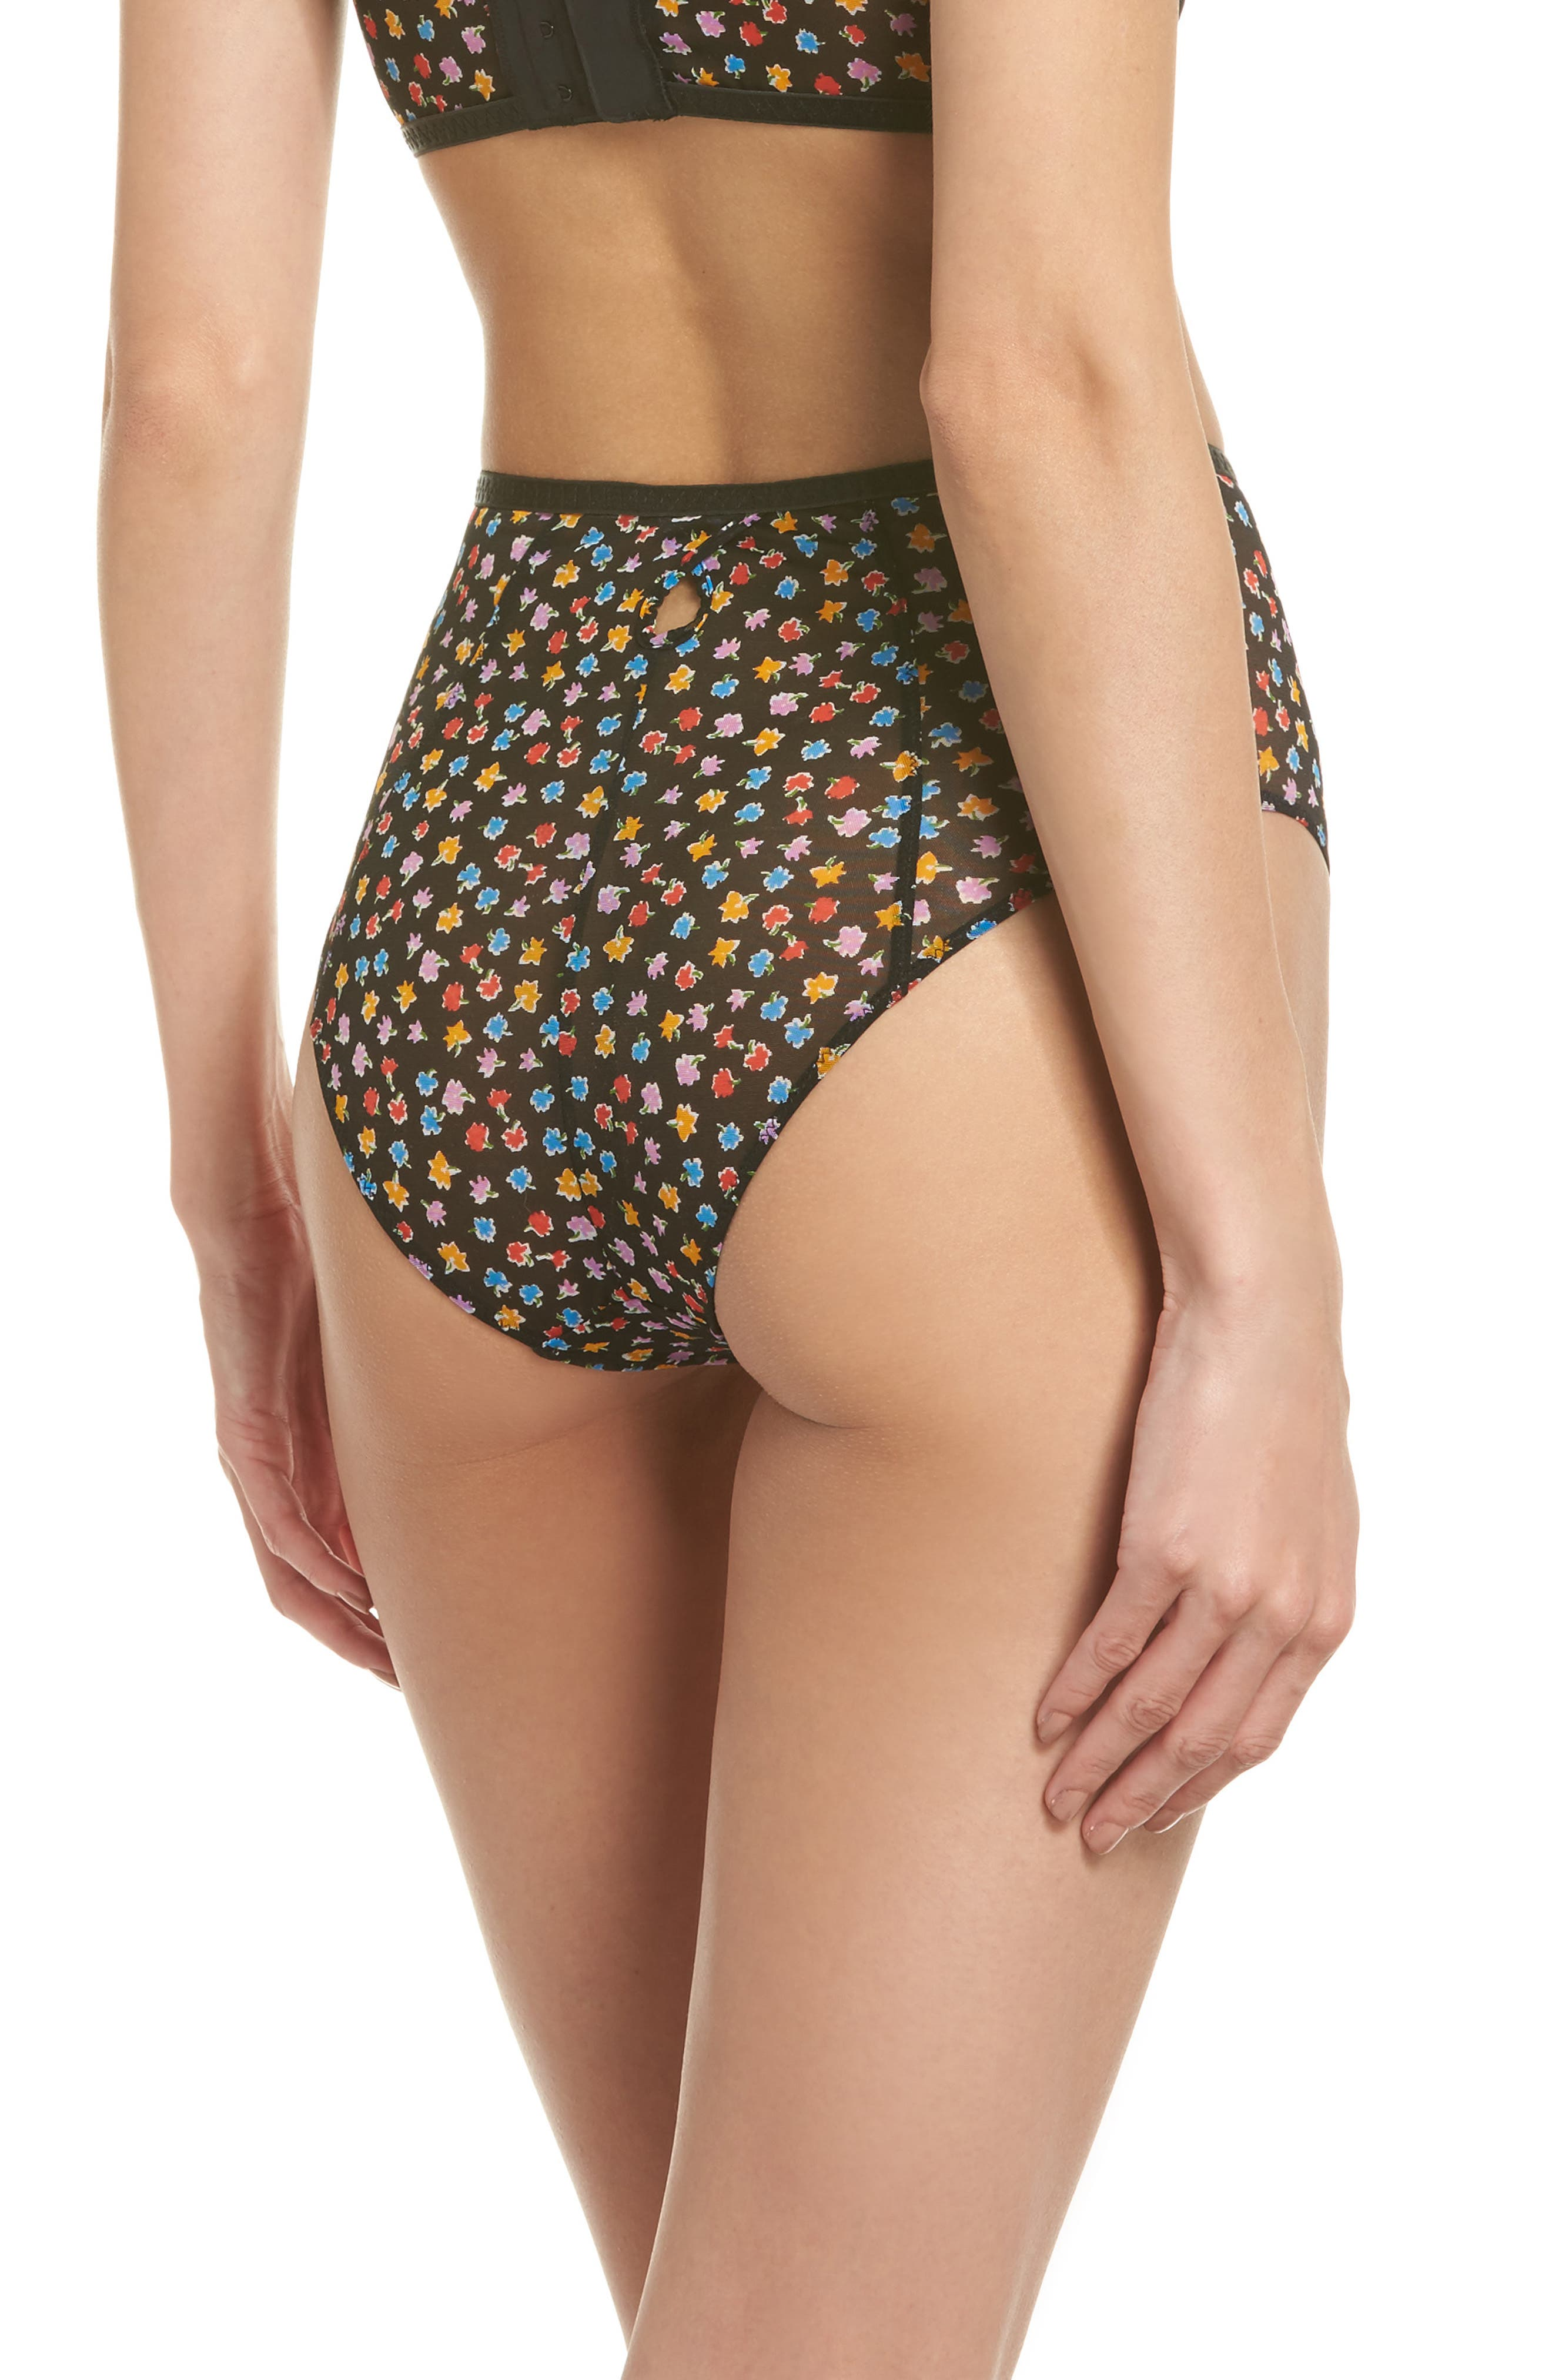 Intimately FP Capri High Waist Panties,                             Alternate thumbnail 2, color,                             019